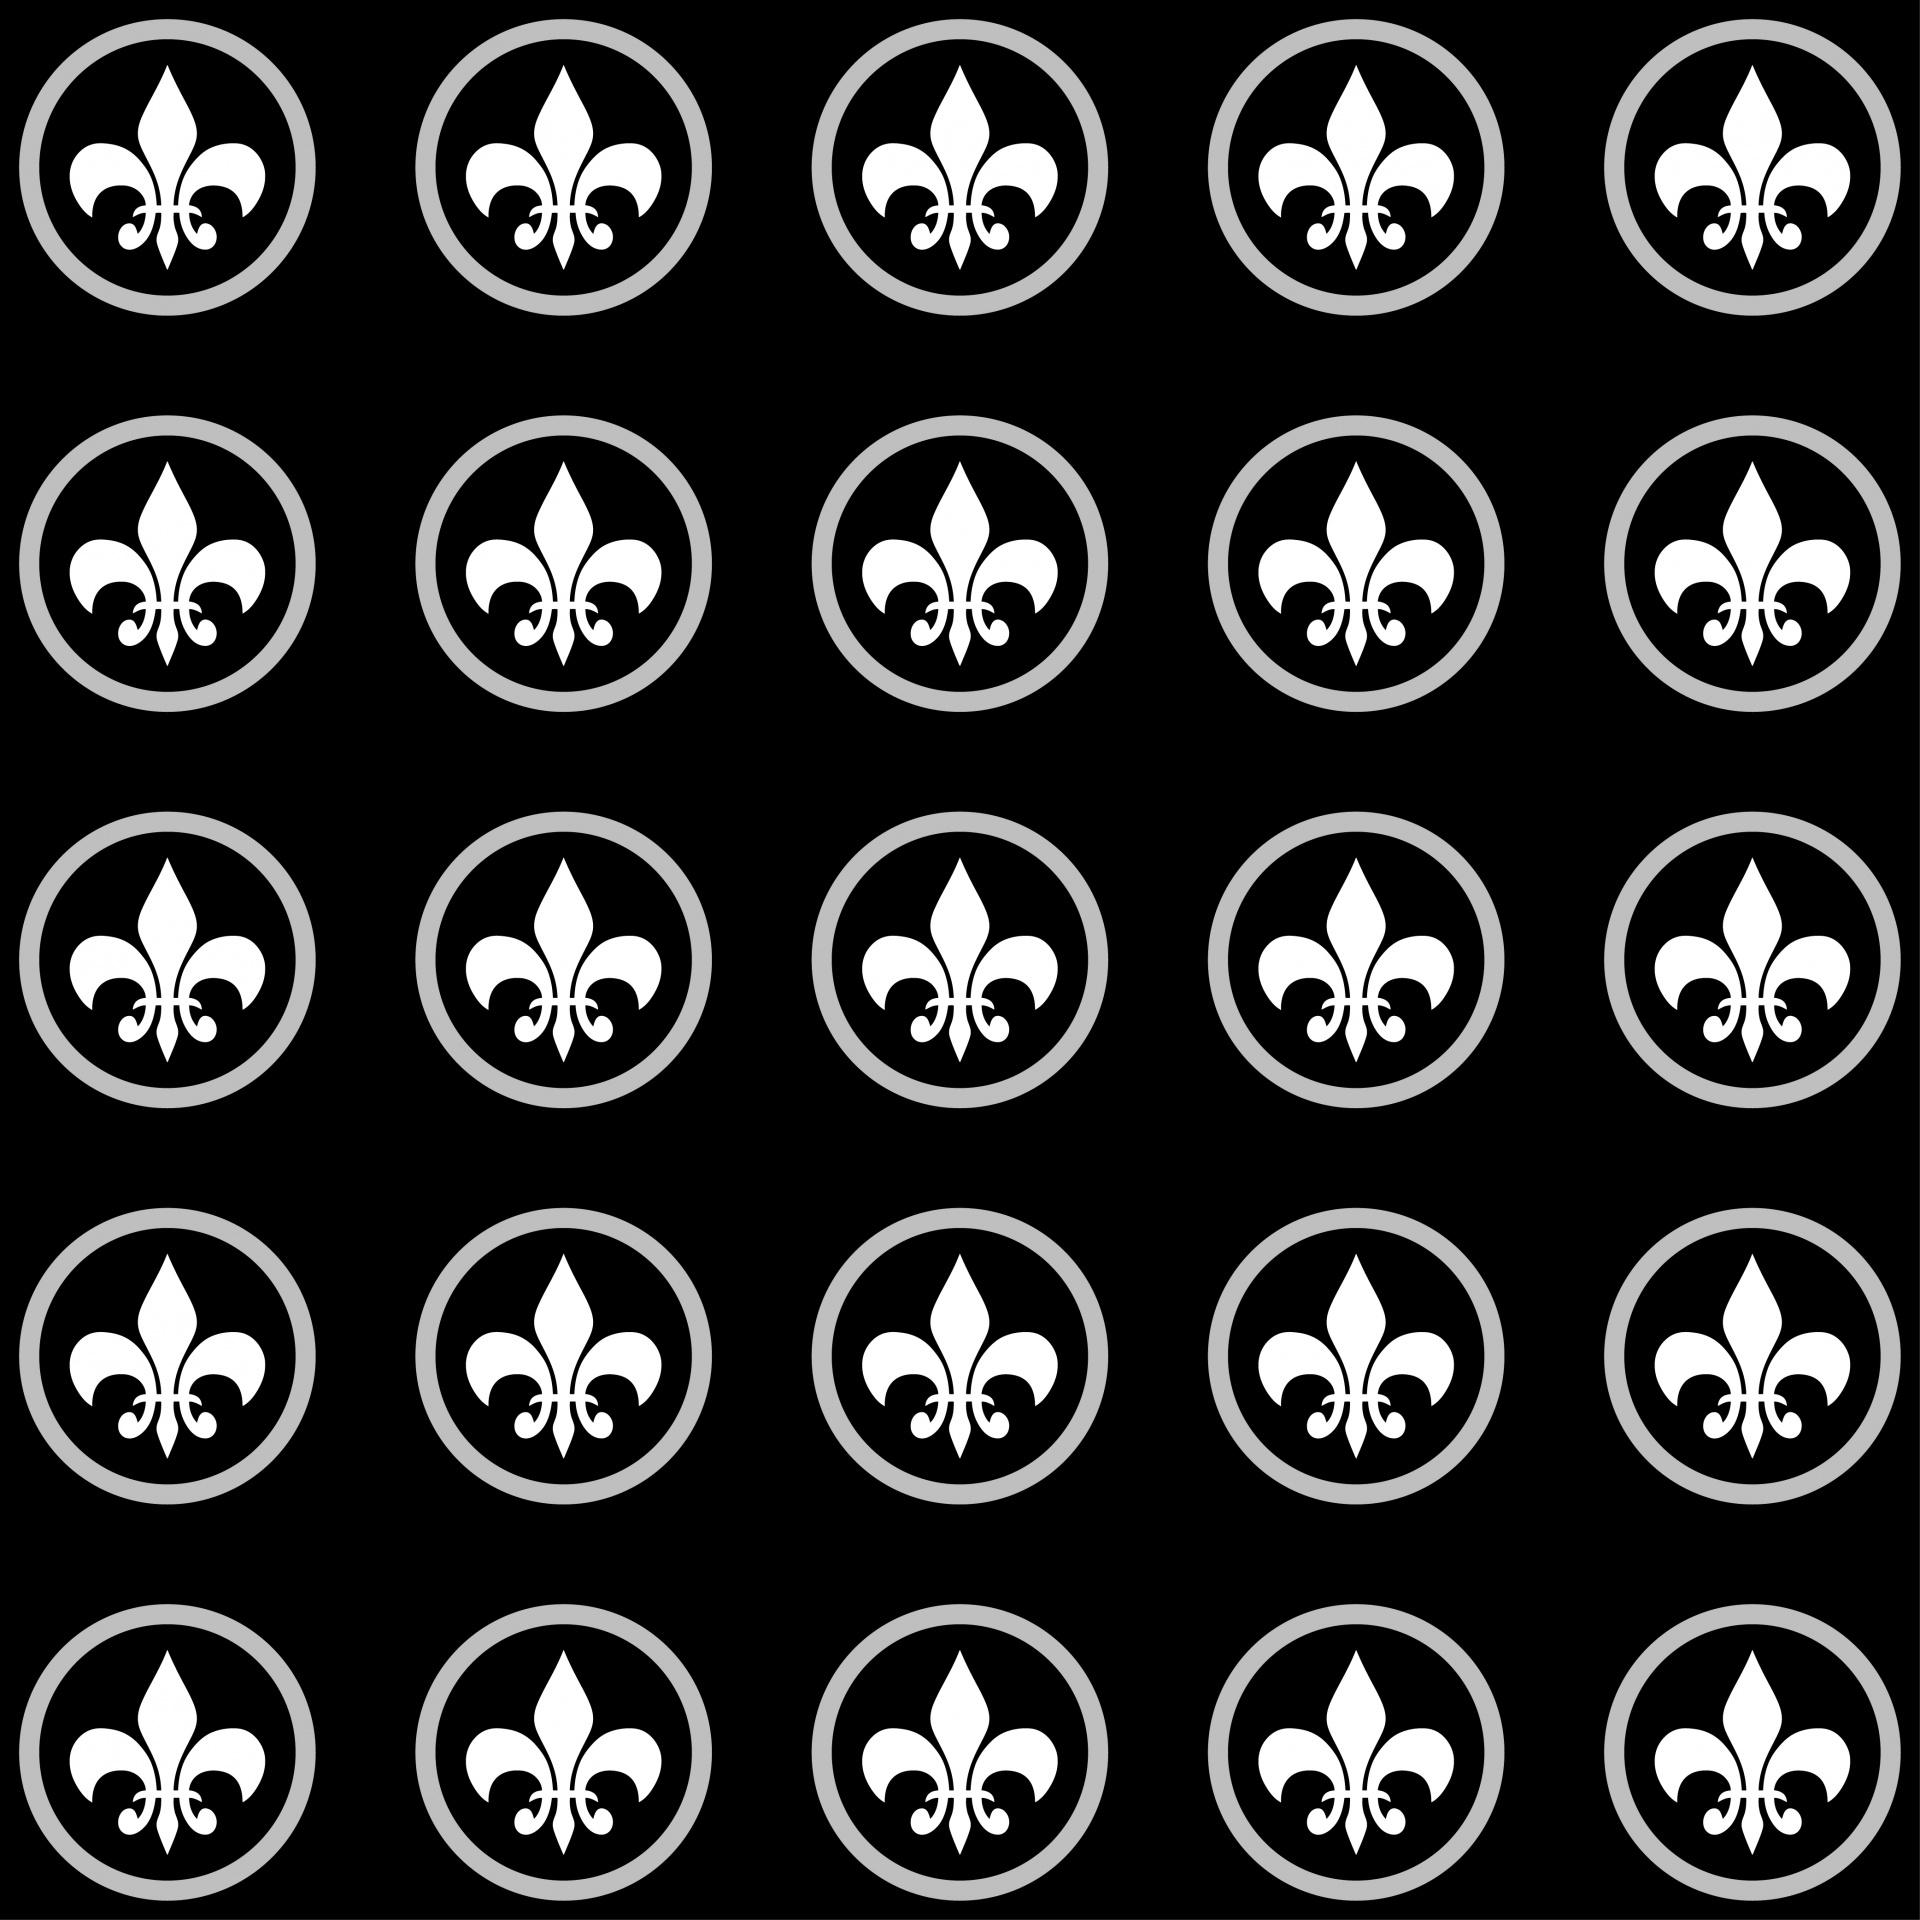 Wallpaper Design Black Fleur De Lis Pattern Wallpaper Free Stock Photo Public